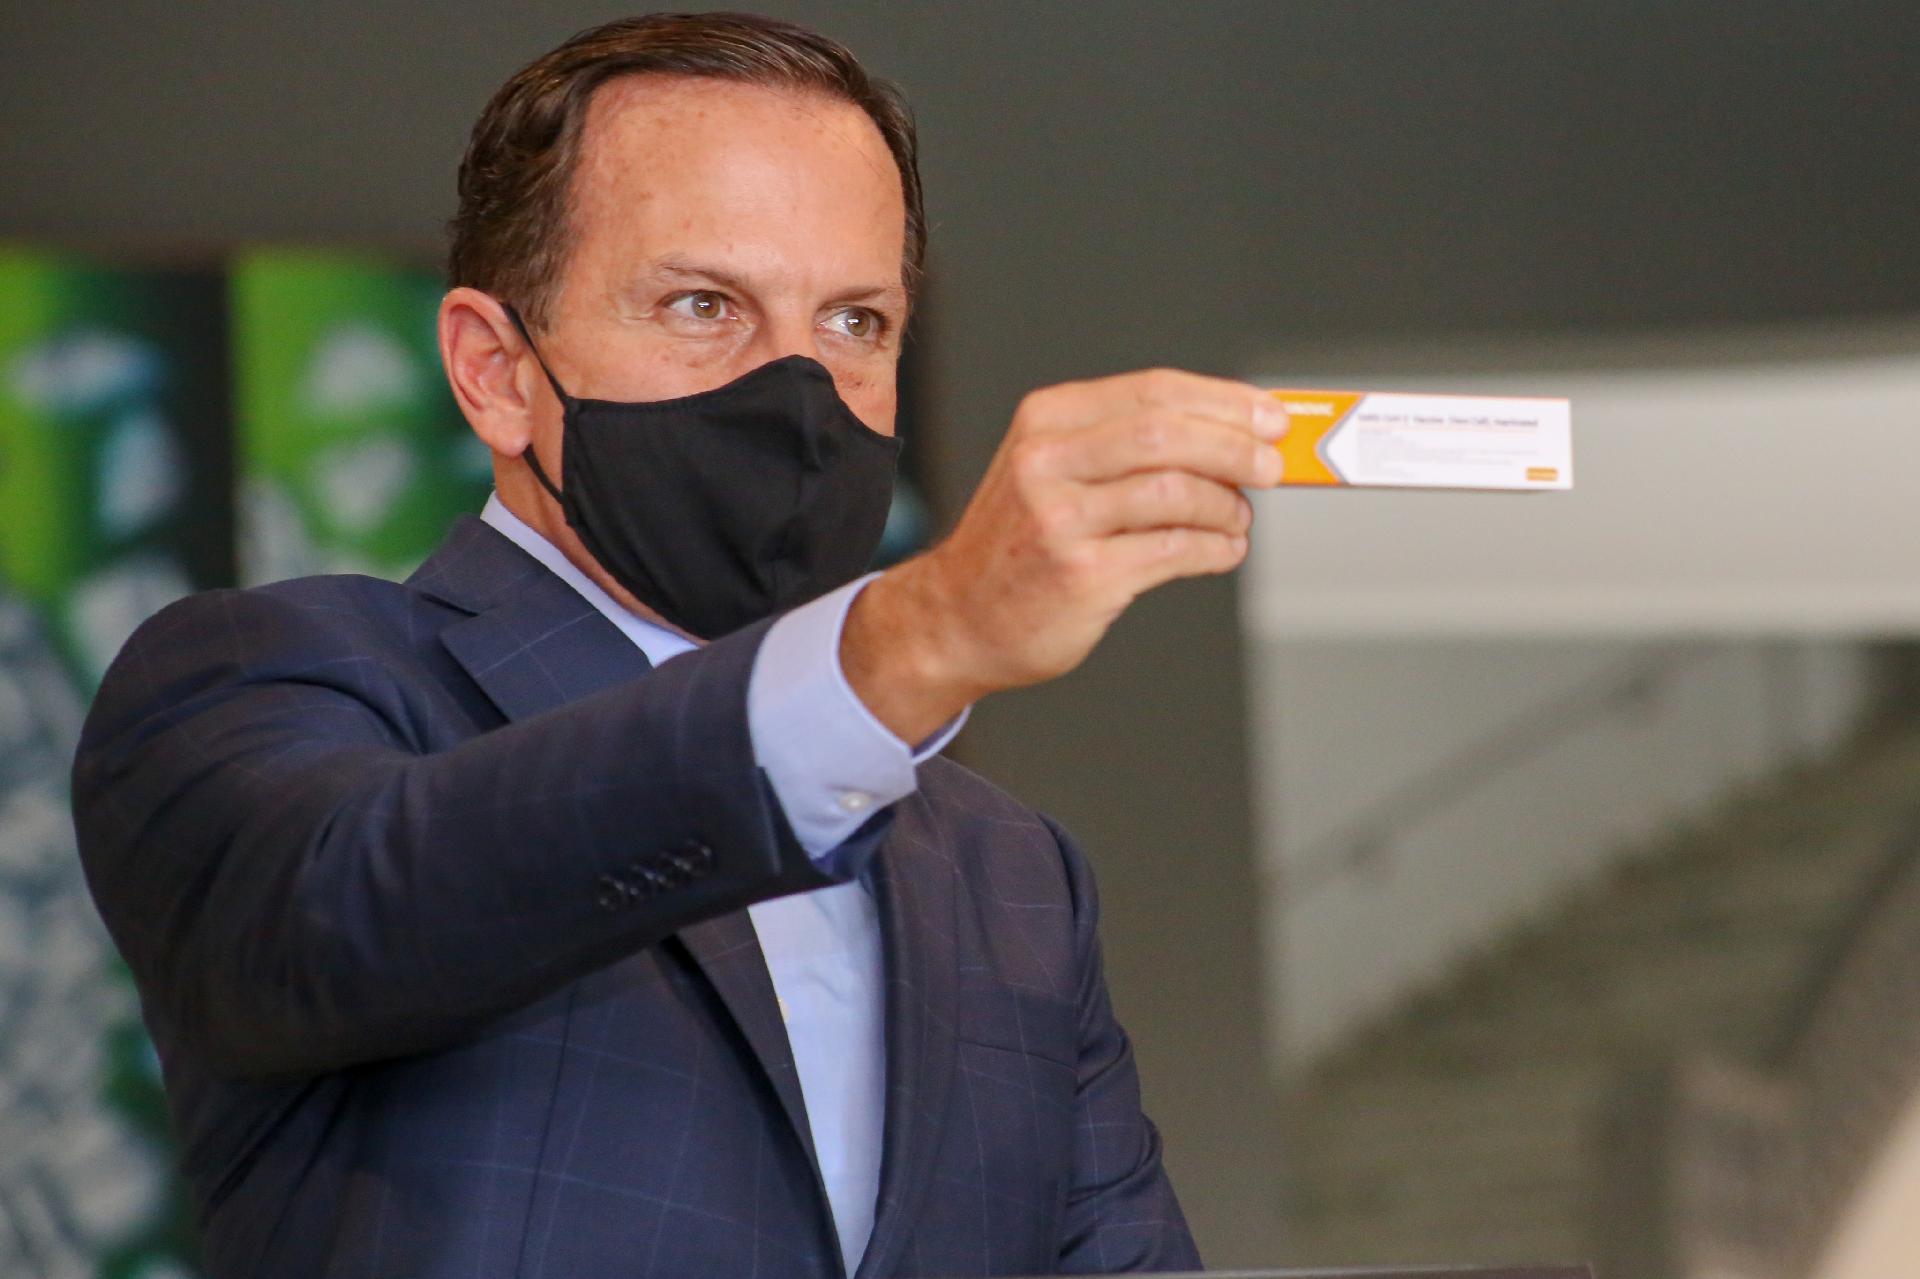 Vacina contra a Covid-19: governo de SP que registro definitivo da Anvisa